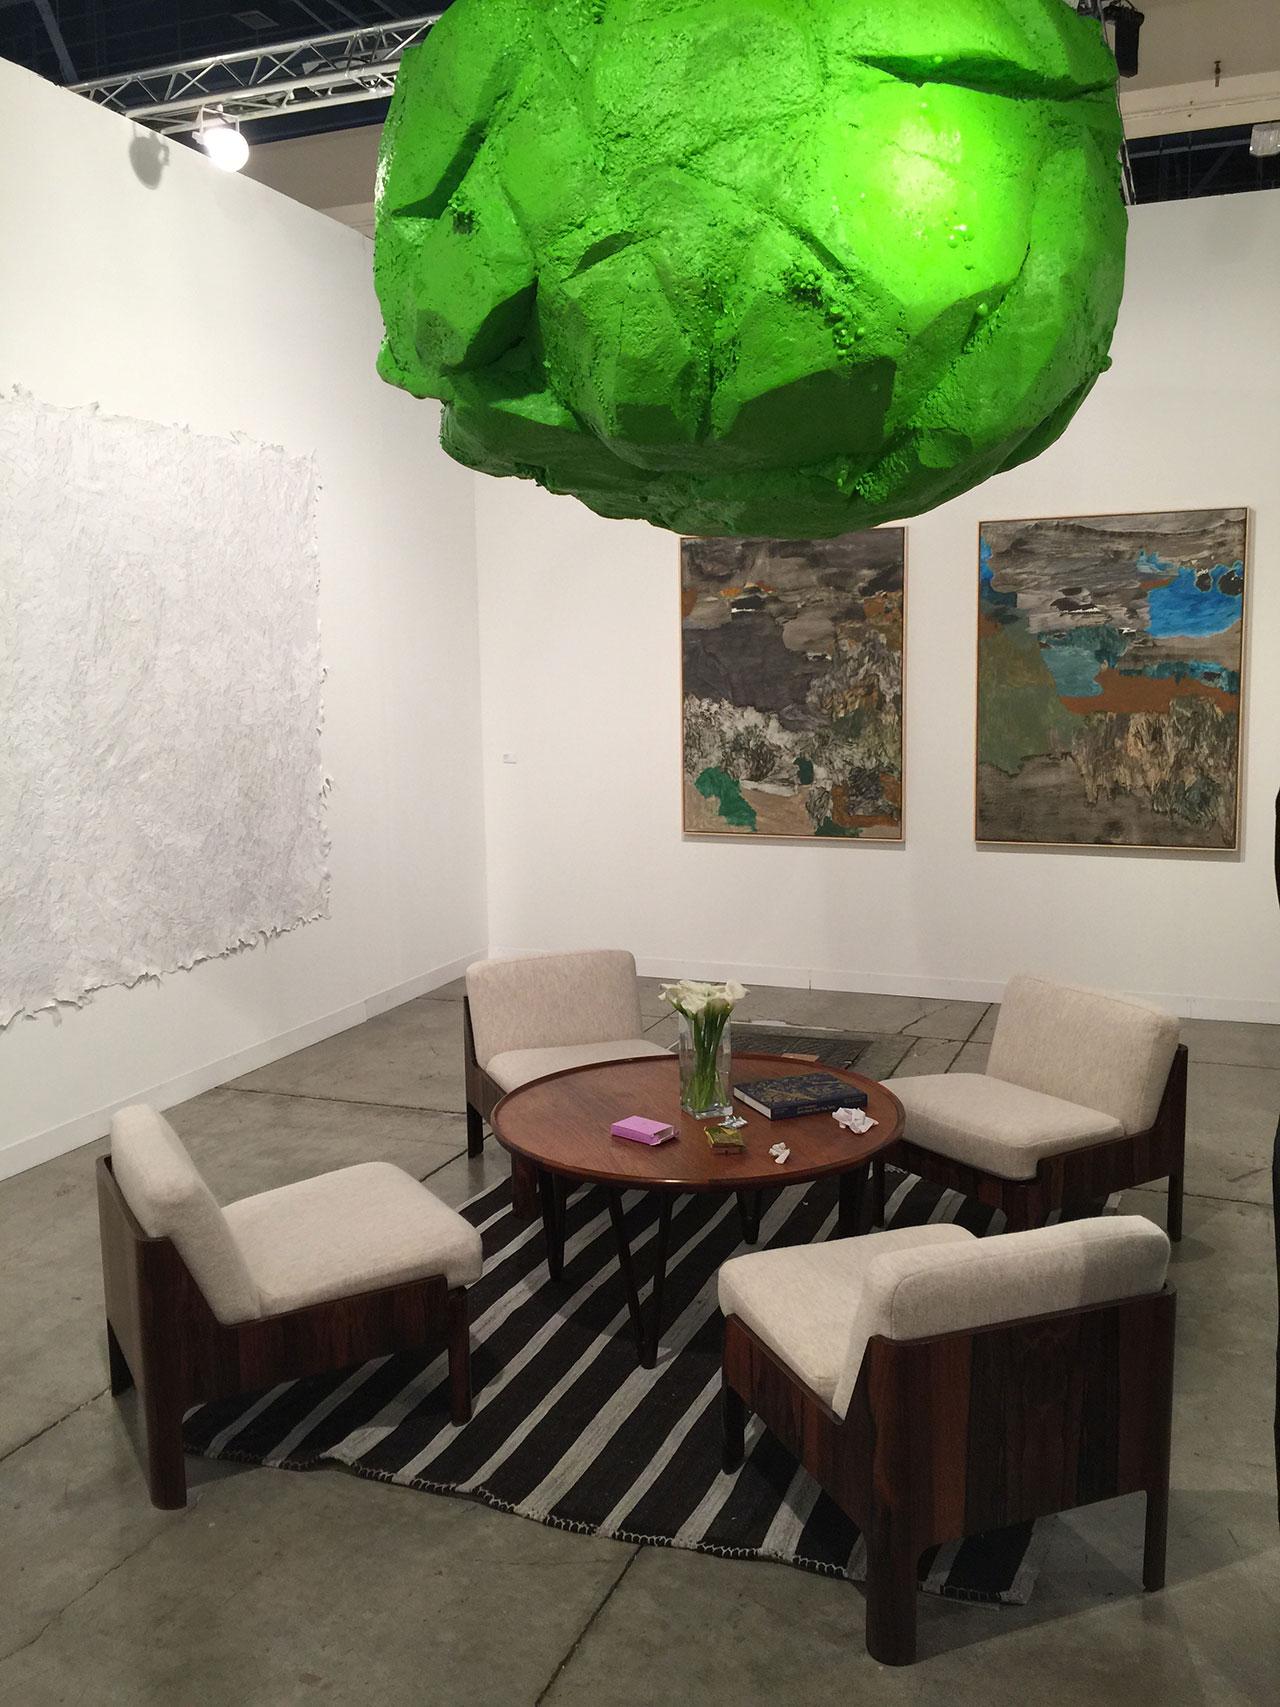 At London's Stephen Friedman gallery